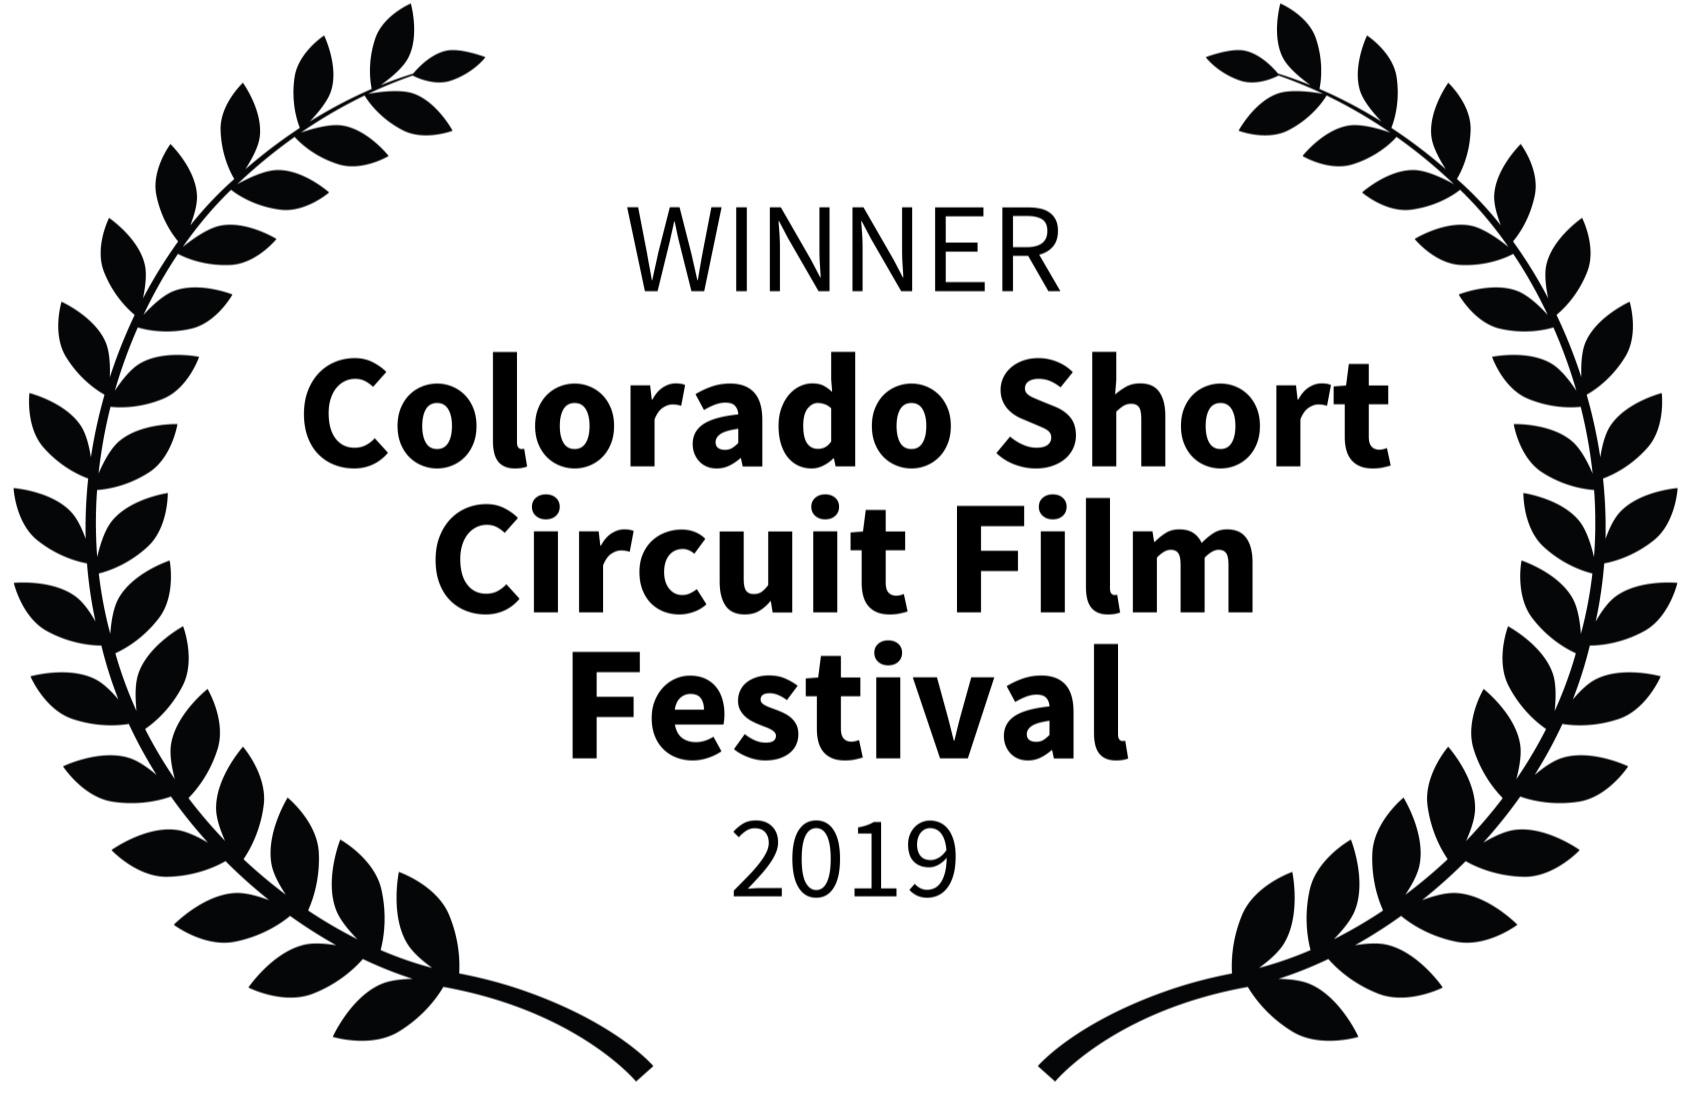 WINNER - Colorado Short Circuit Film Festival - 2019-2.png